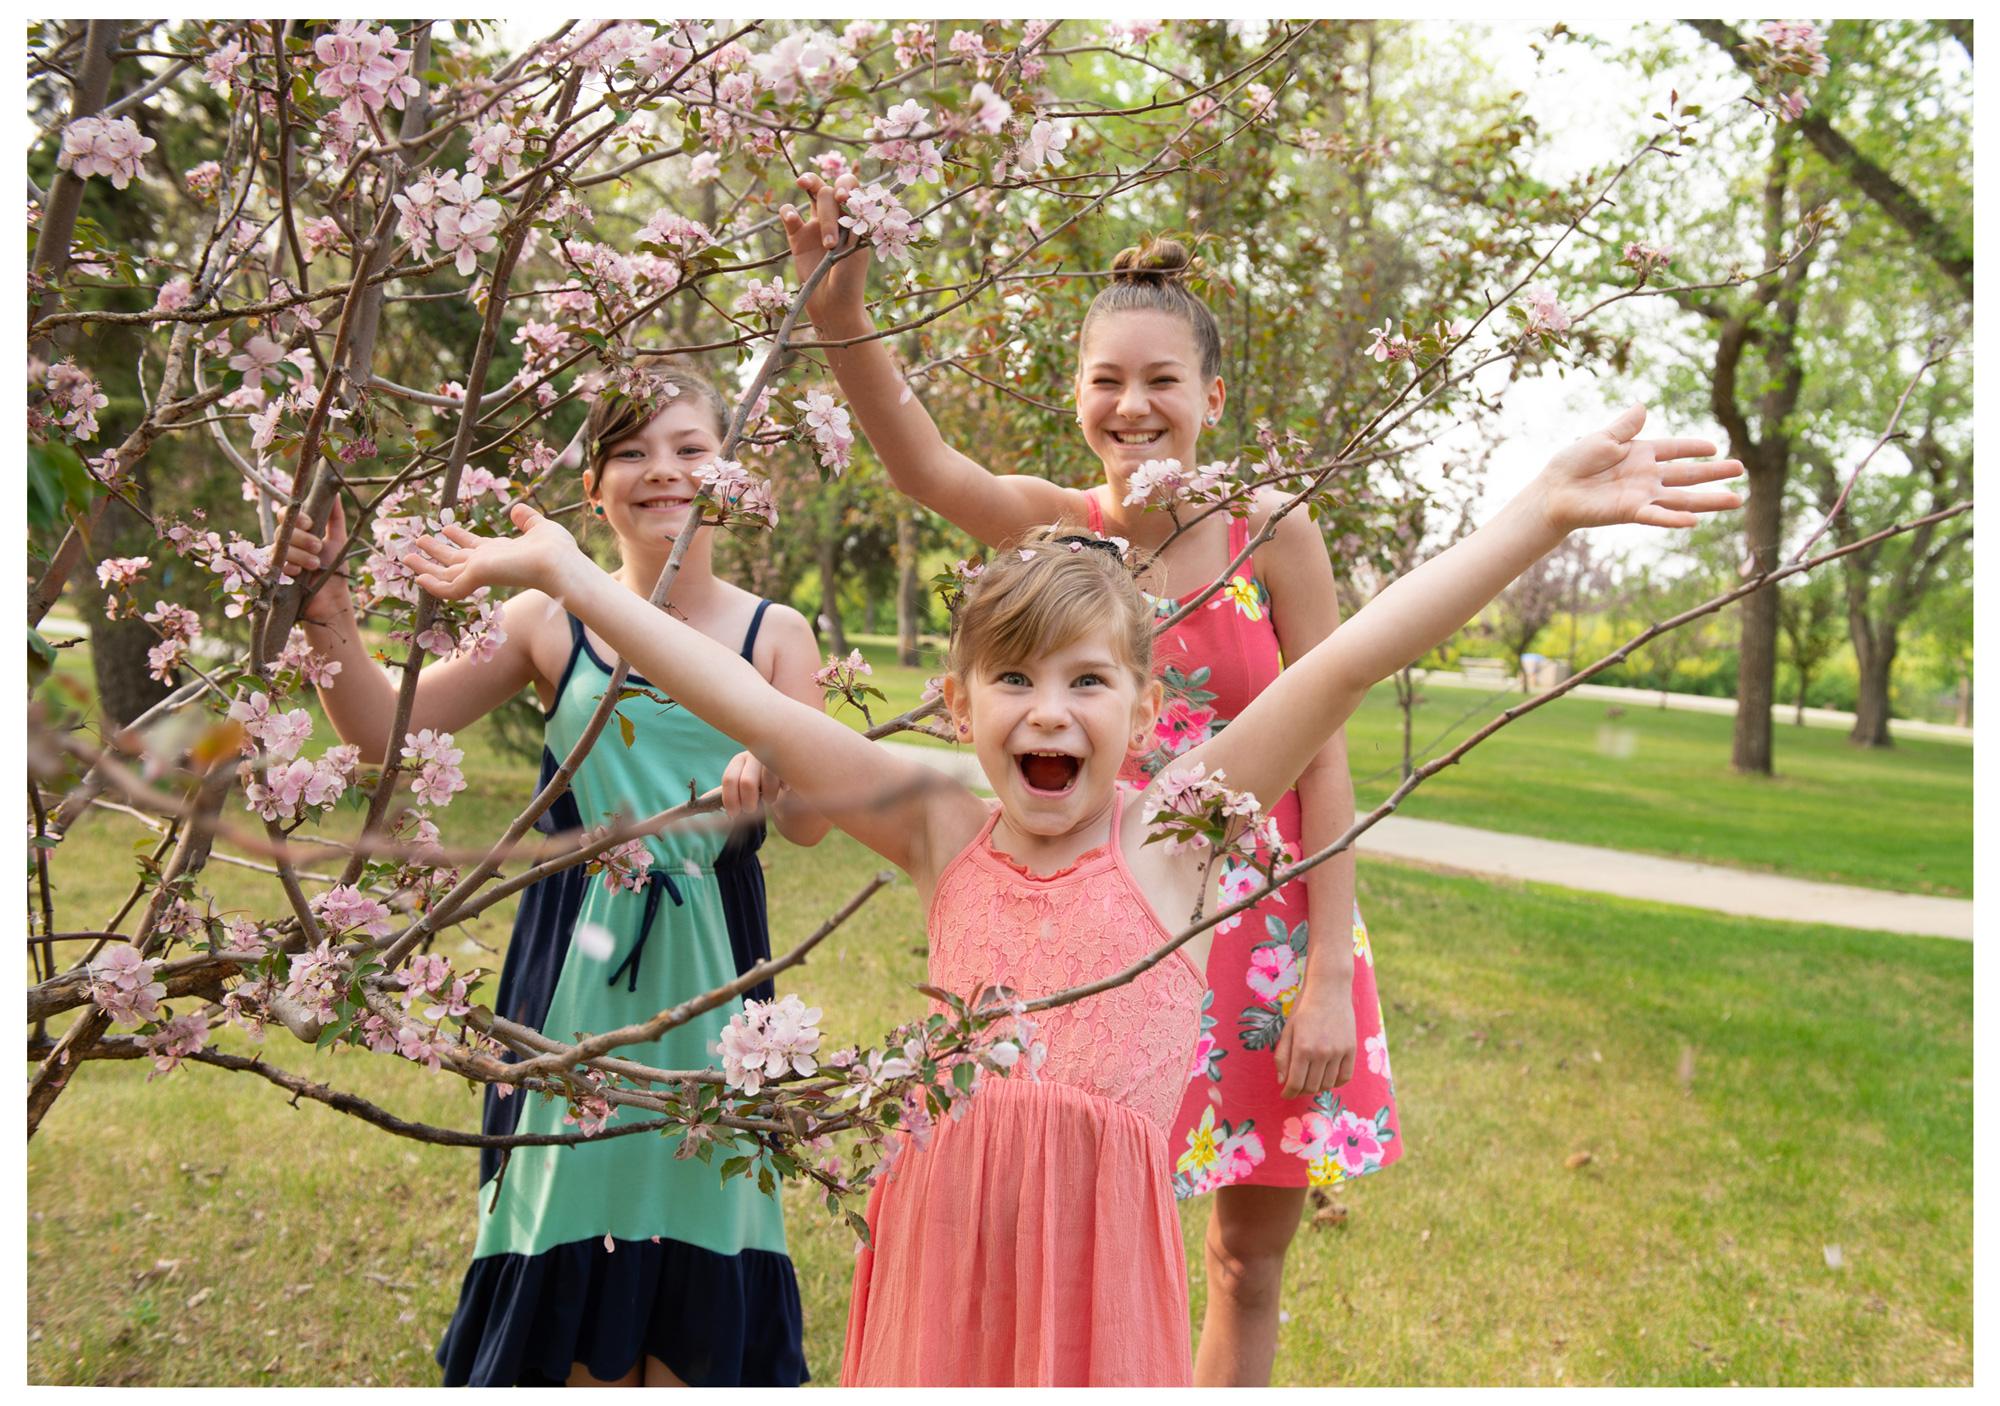 adorable-trio-free-lense-photo.jpg